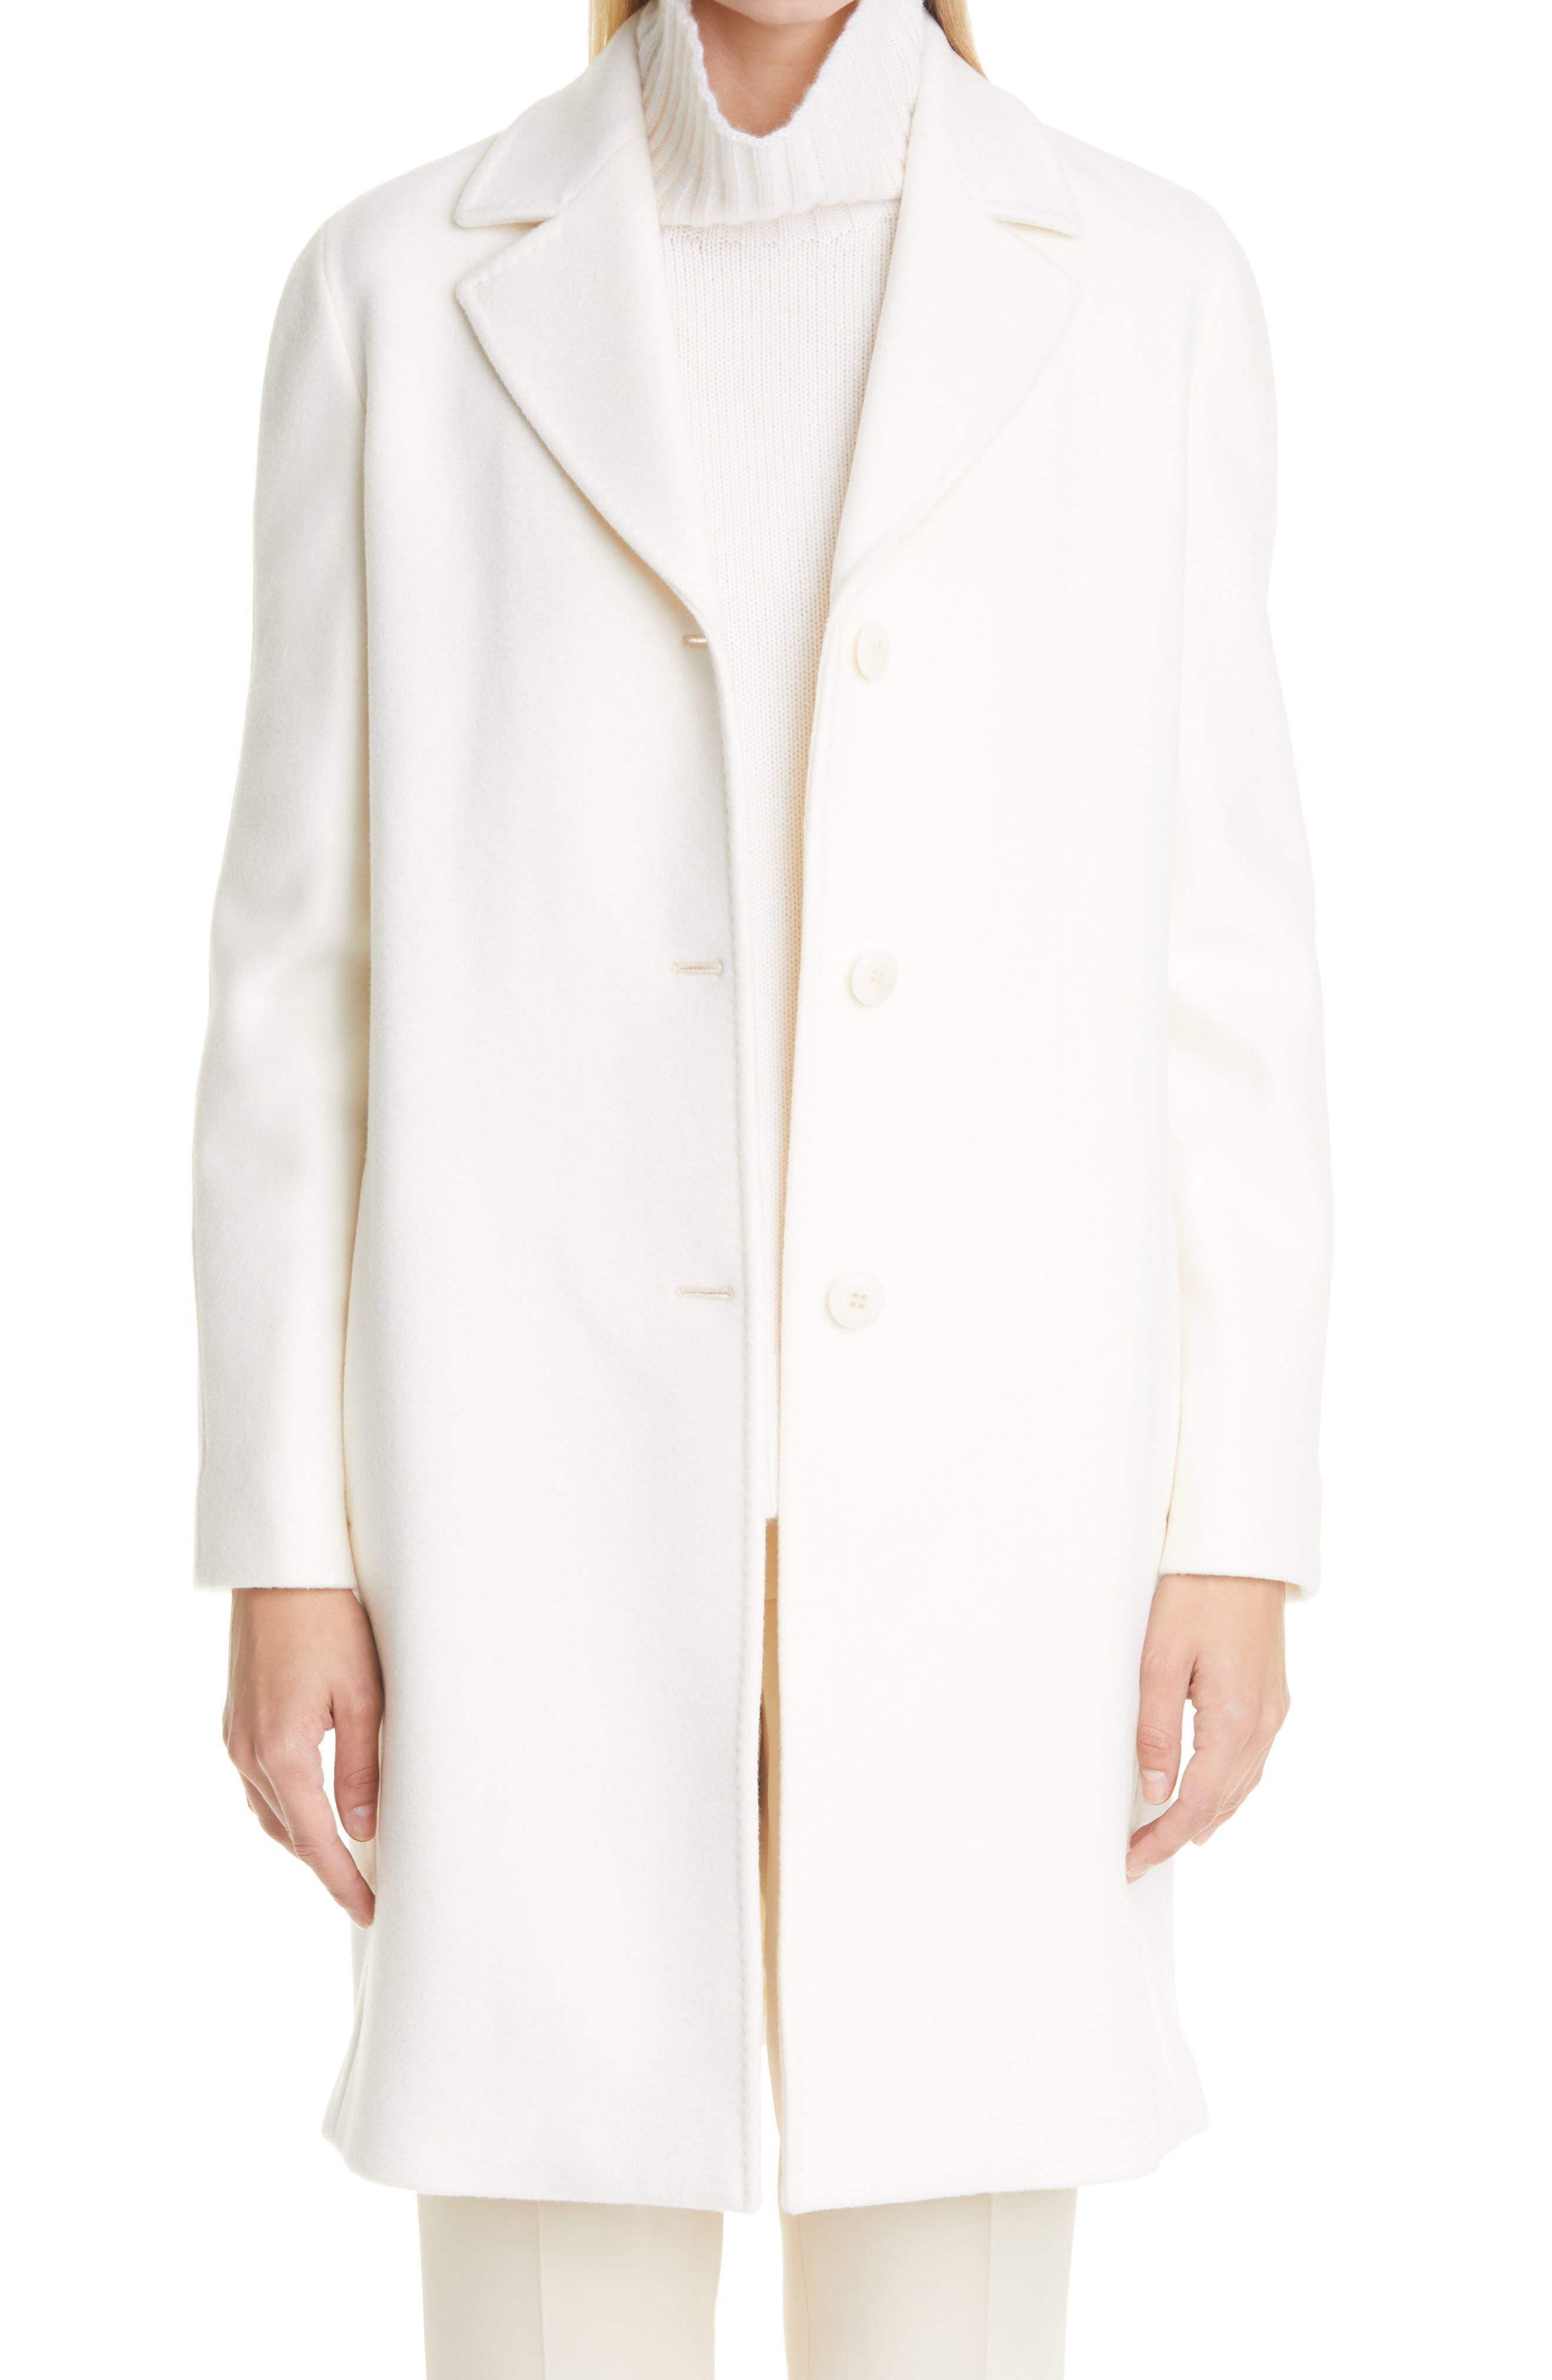 Ginger Virgin Wool Coat